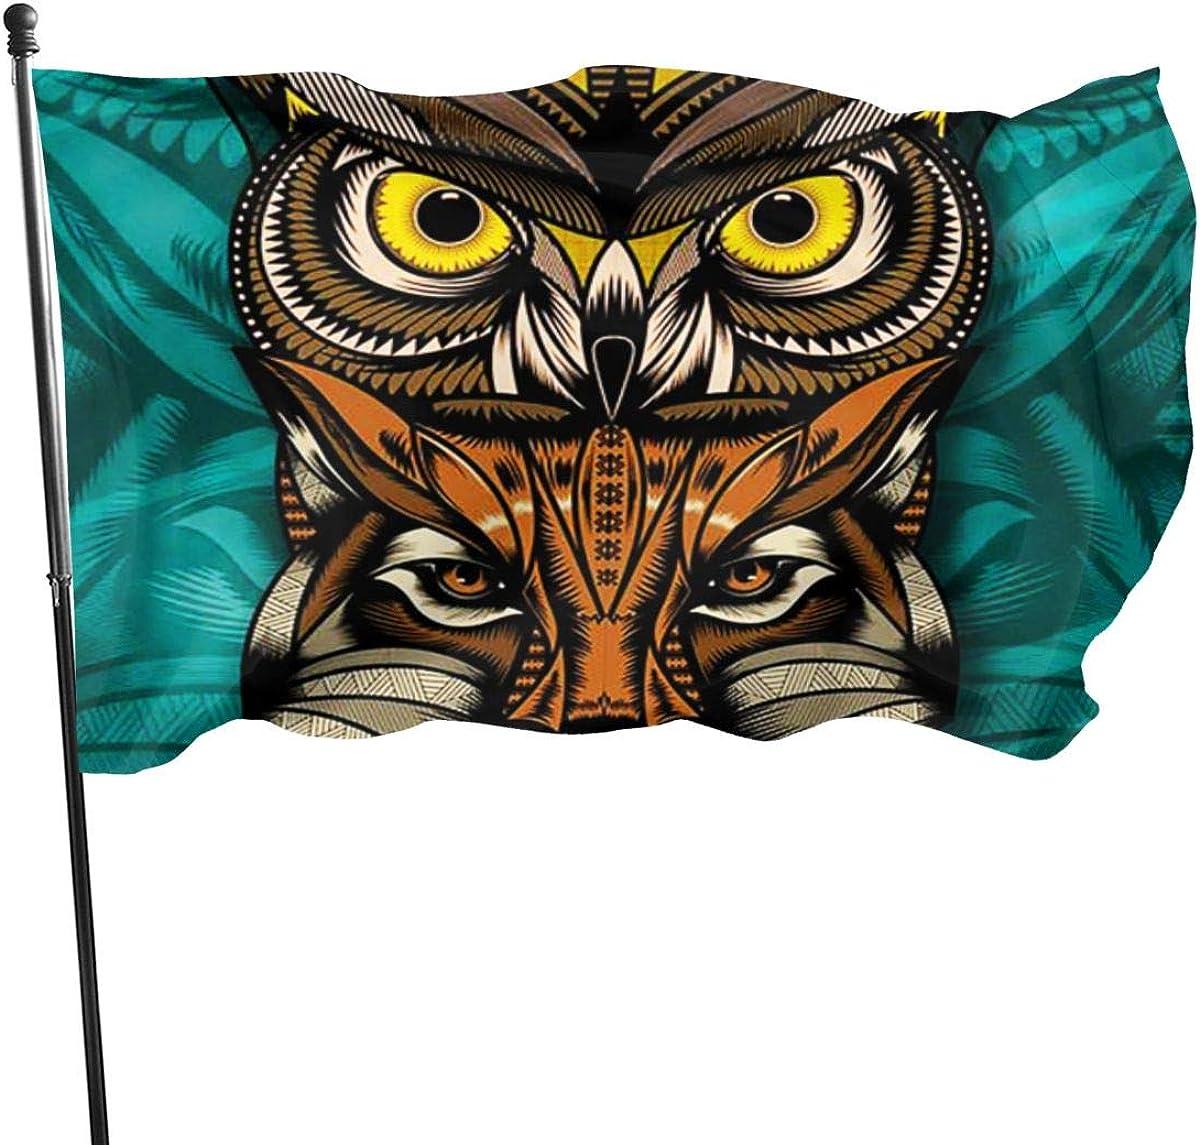 Pop Cat Owl Wolf Maya Art Home Garden Flag Yard Outdoor Indoor Decorative Banner with Brass Grommets Flag 3x5 Ft